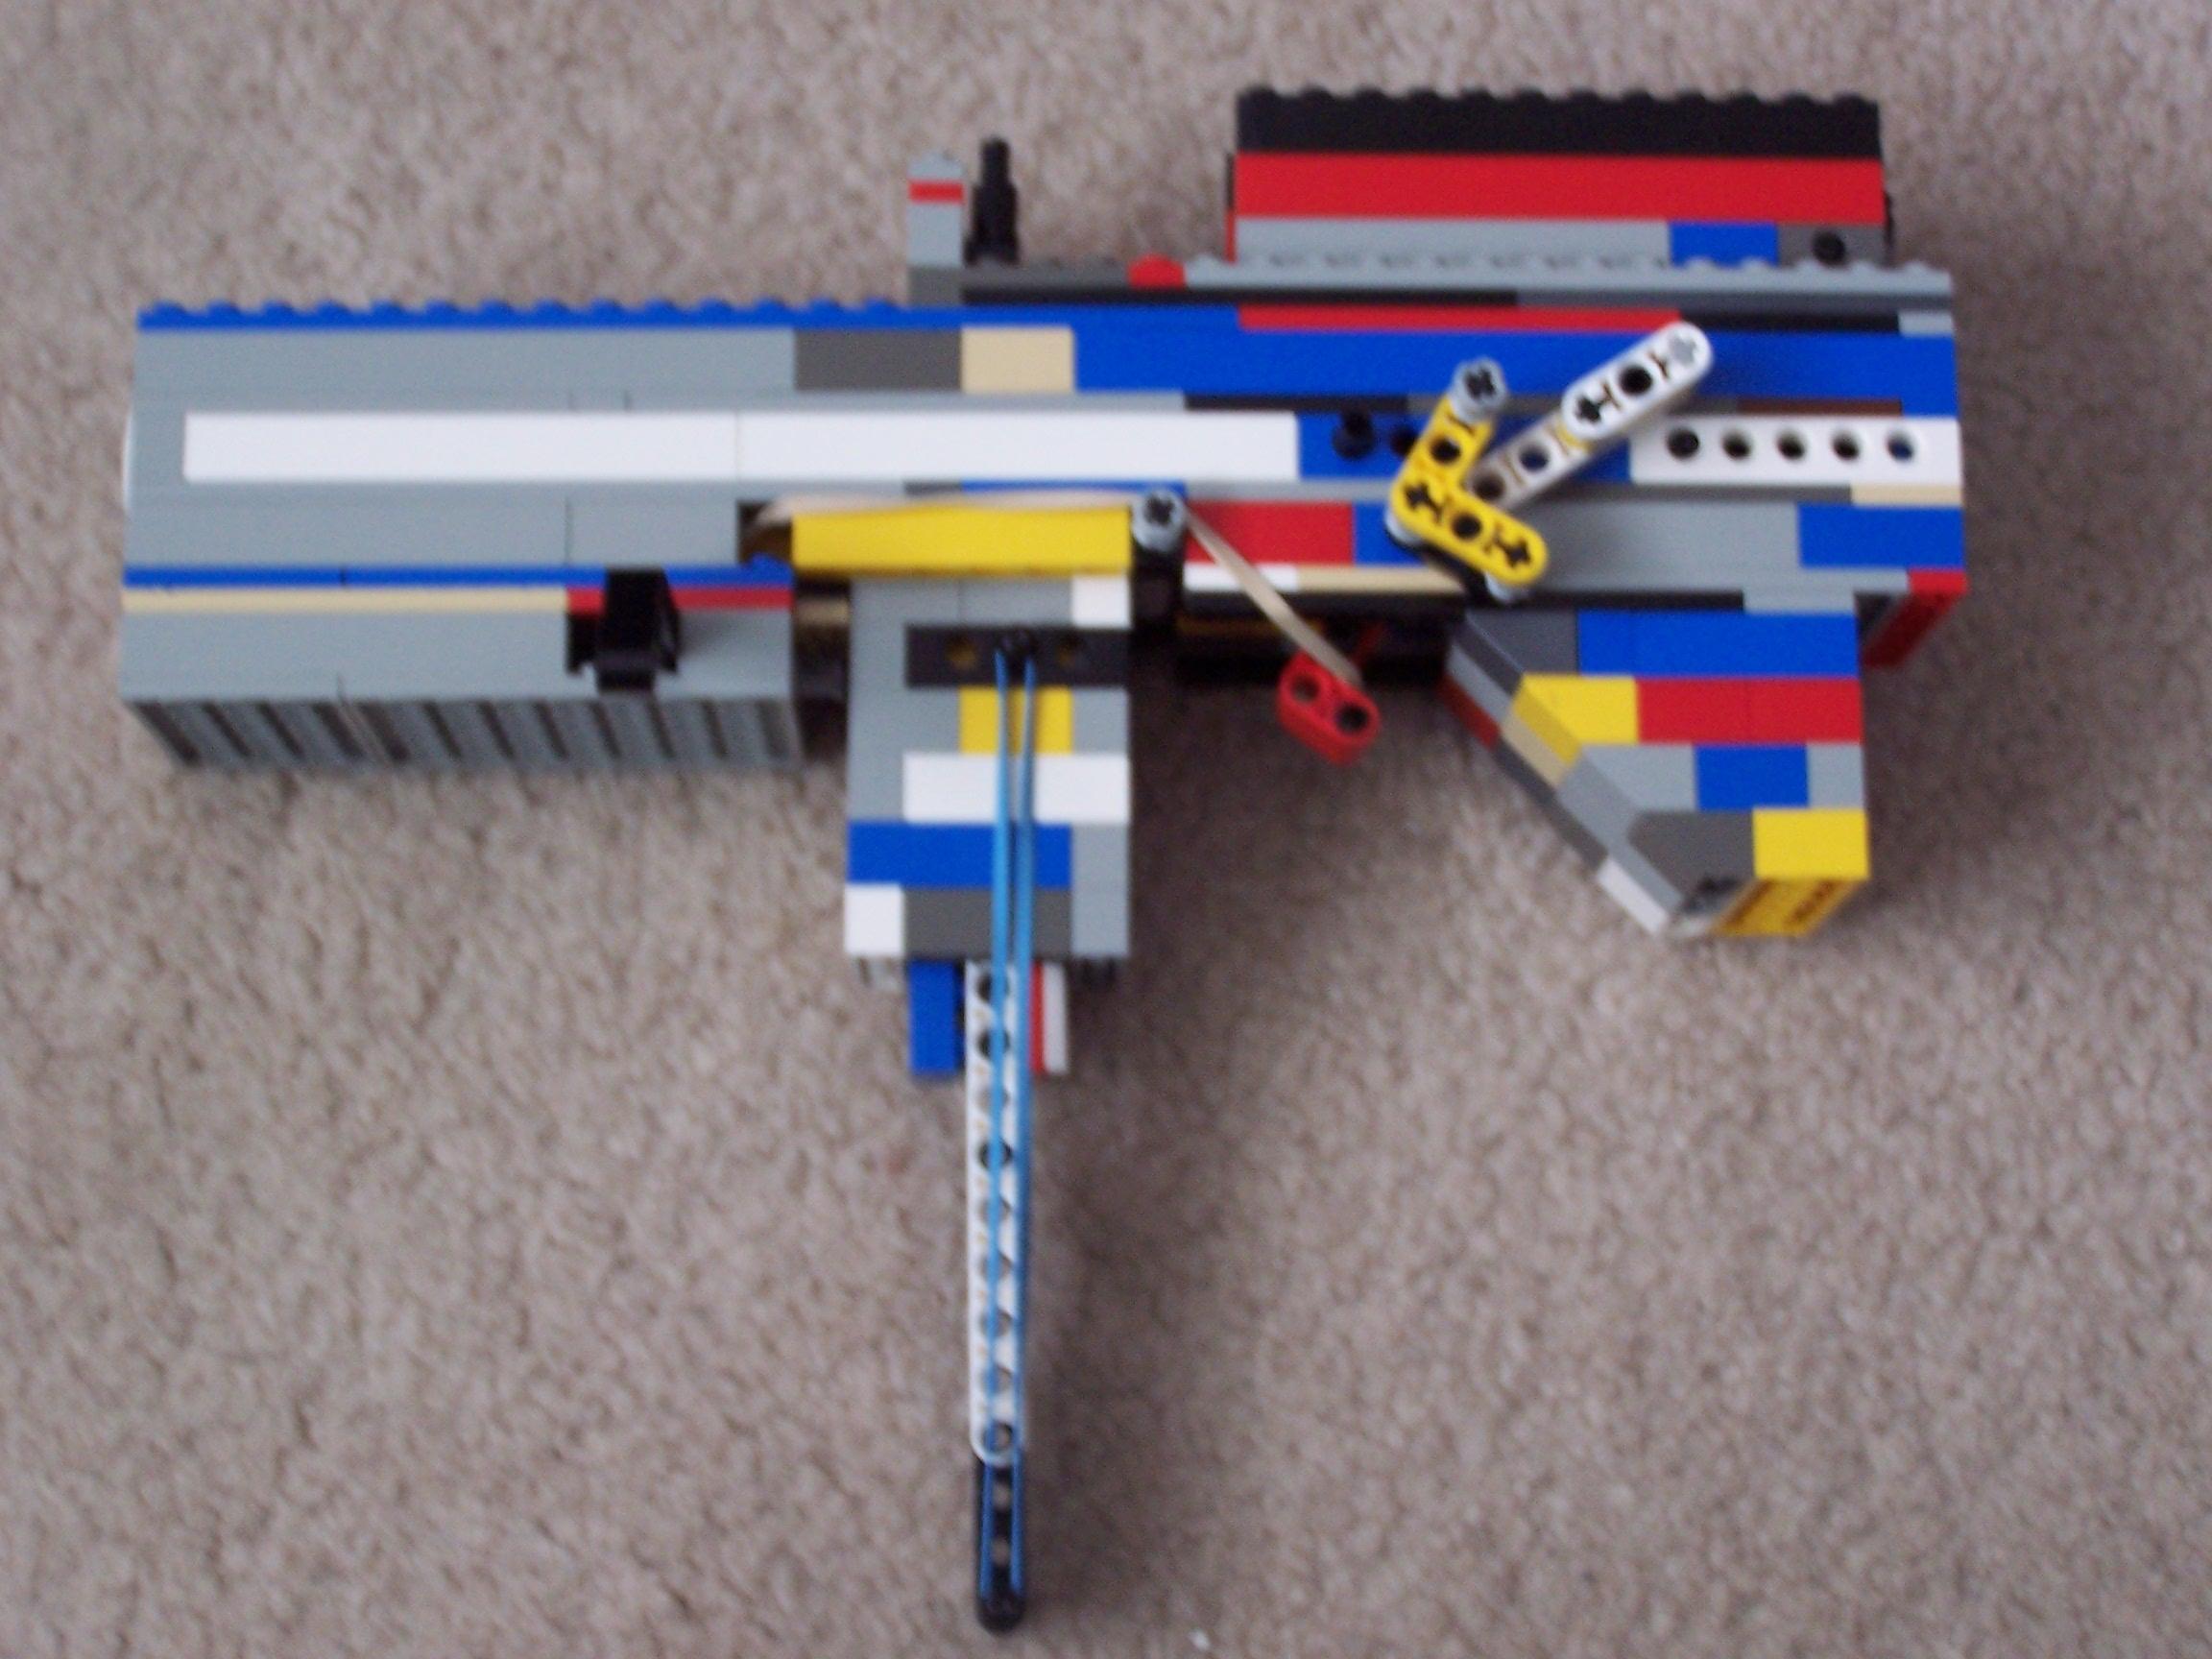 The D3 Lego Semi-Automatic Handgun